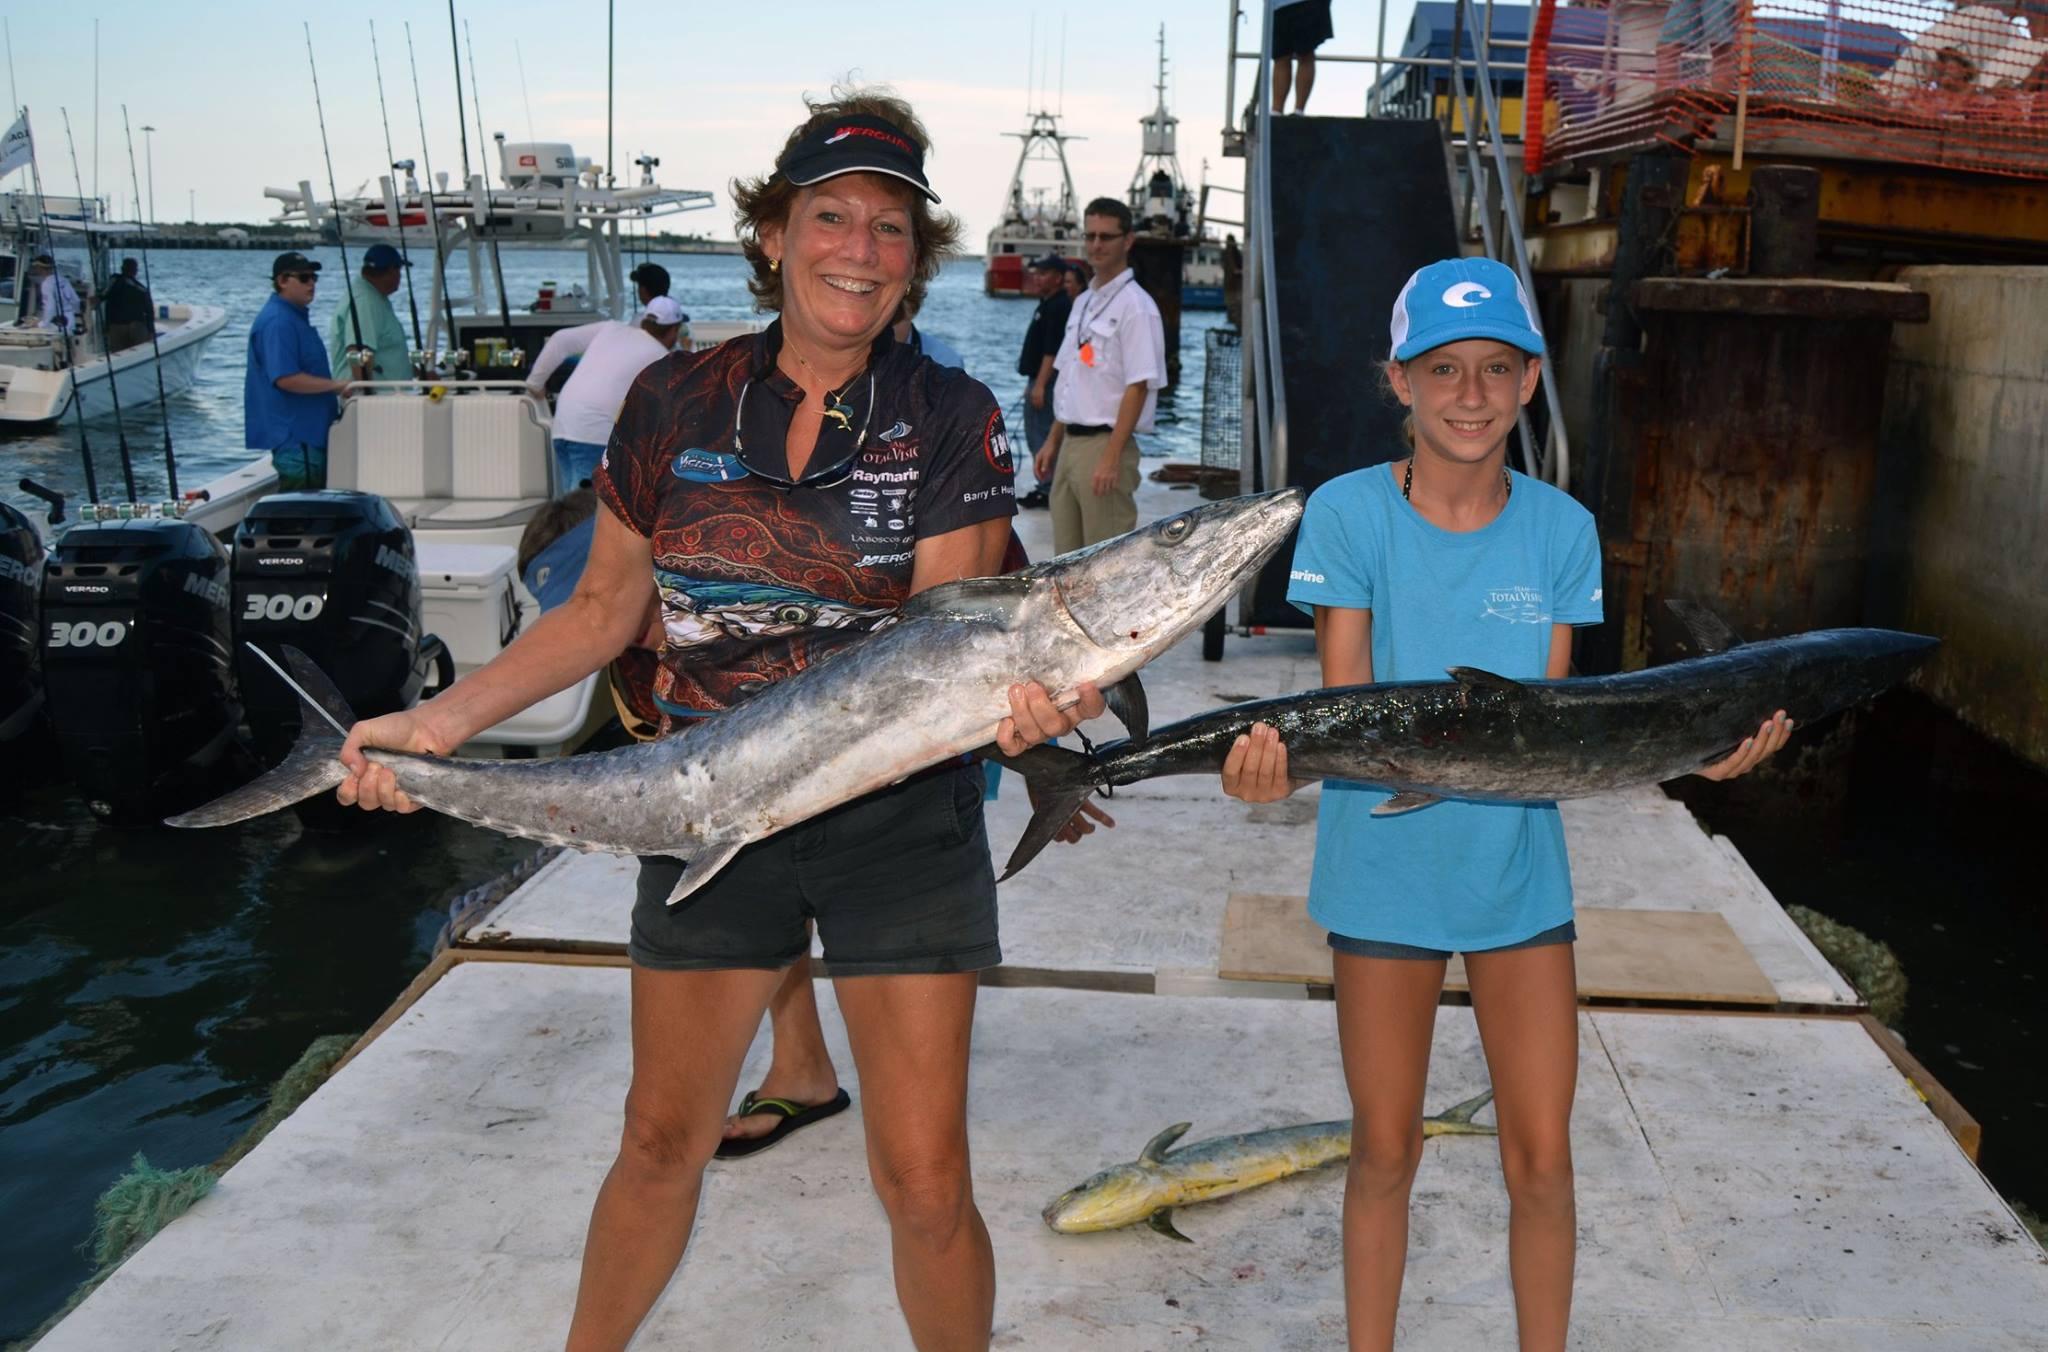 Mac attack new smyrna beach charter fishing in shore for New smyrna fishing charters